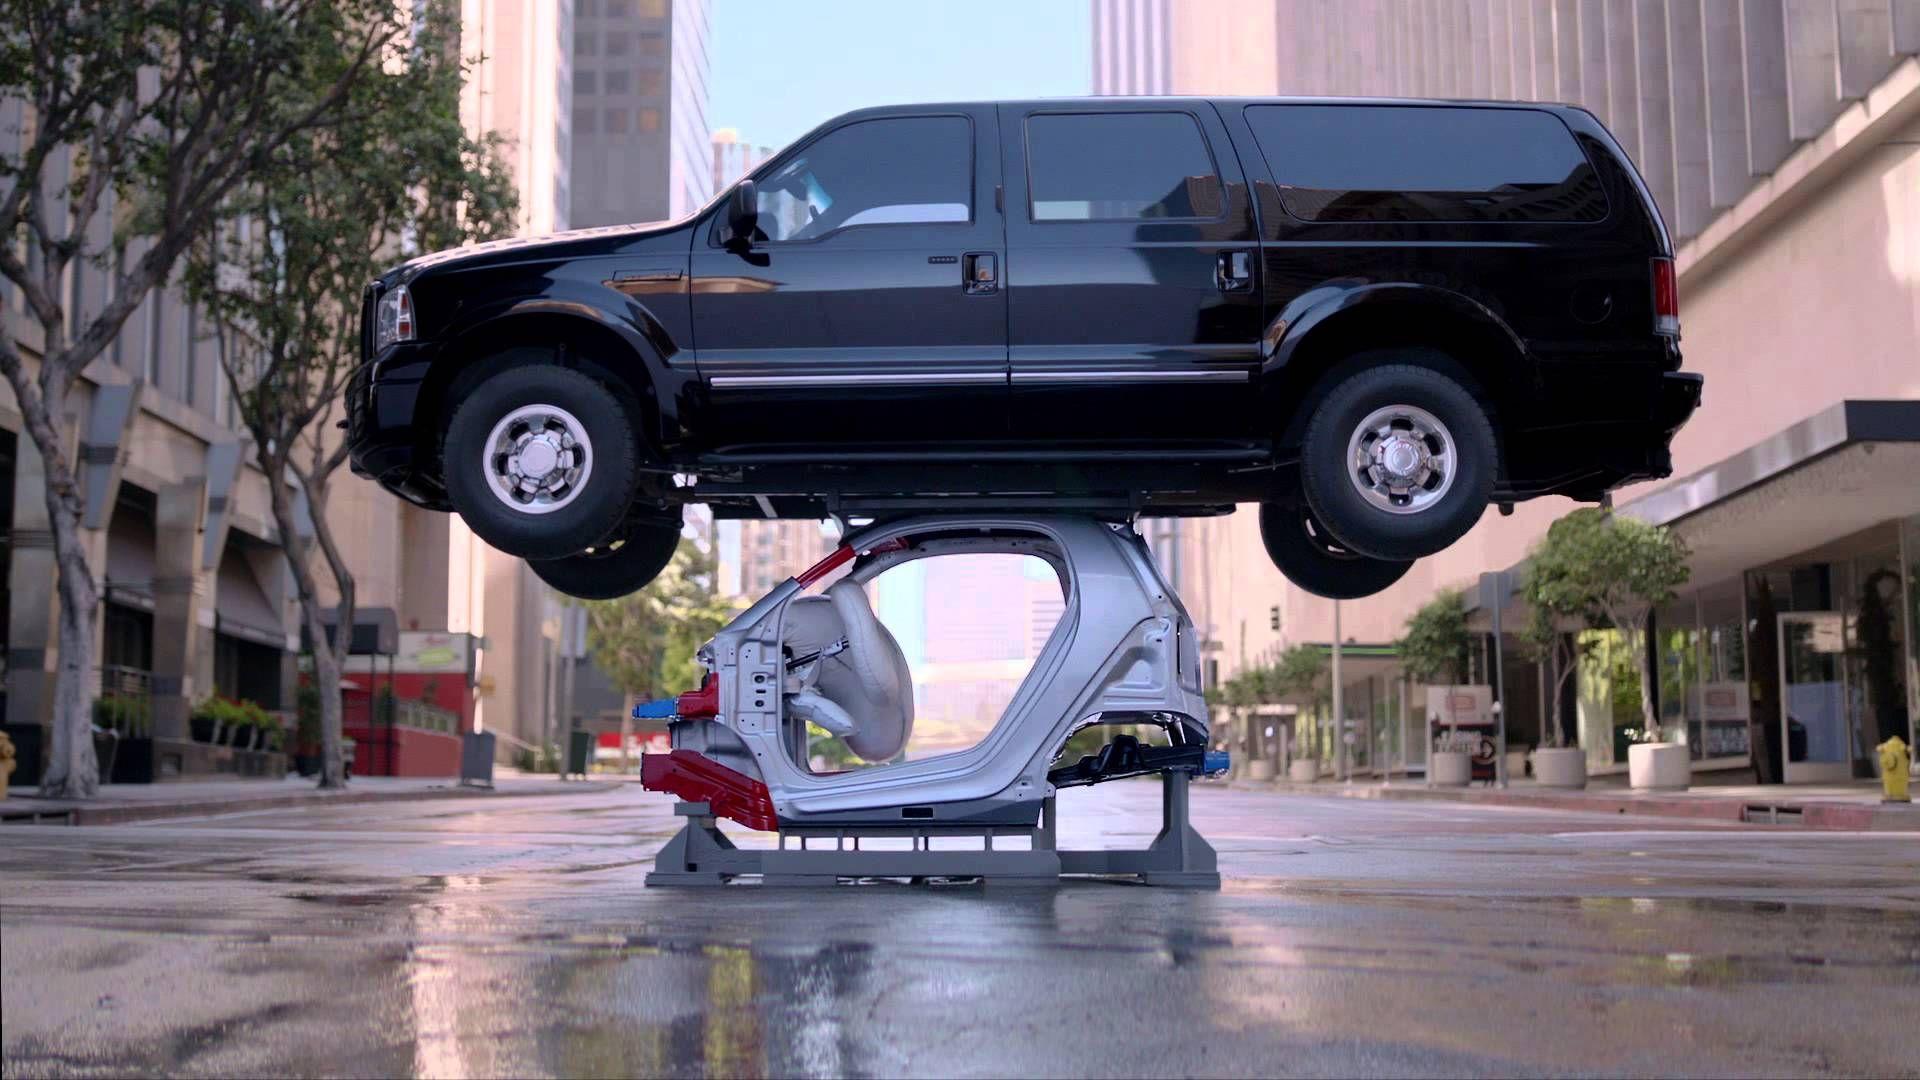 Cancelar   Assistência 24 Horas   Pinterest   Smart car, Car safety ...